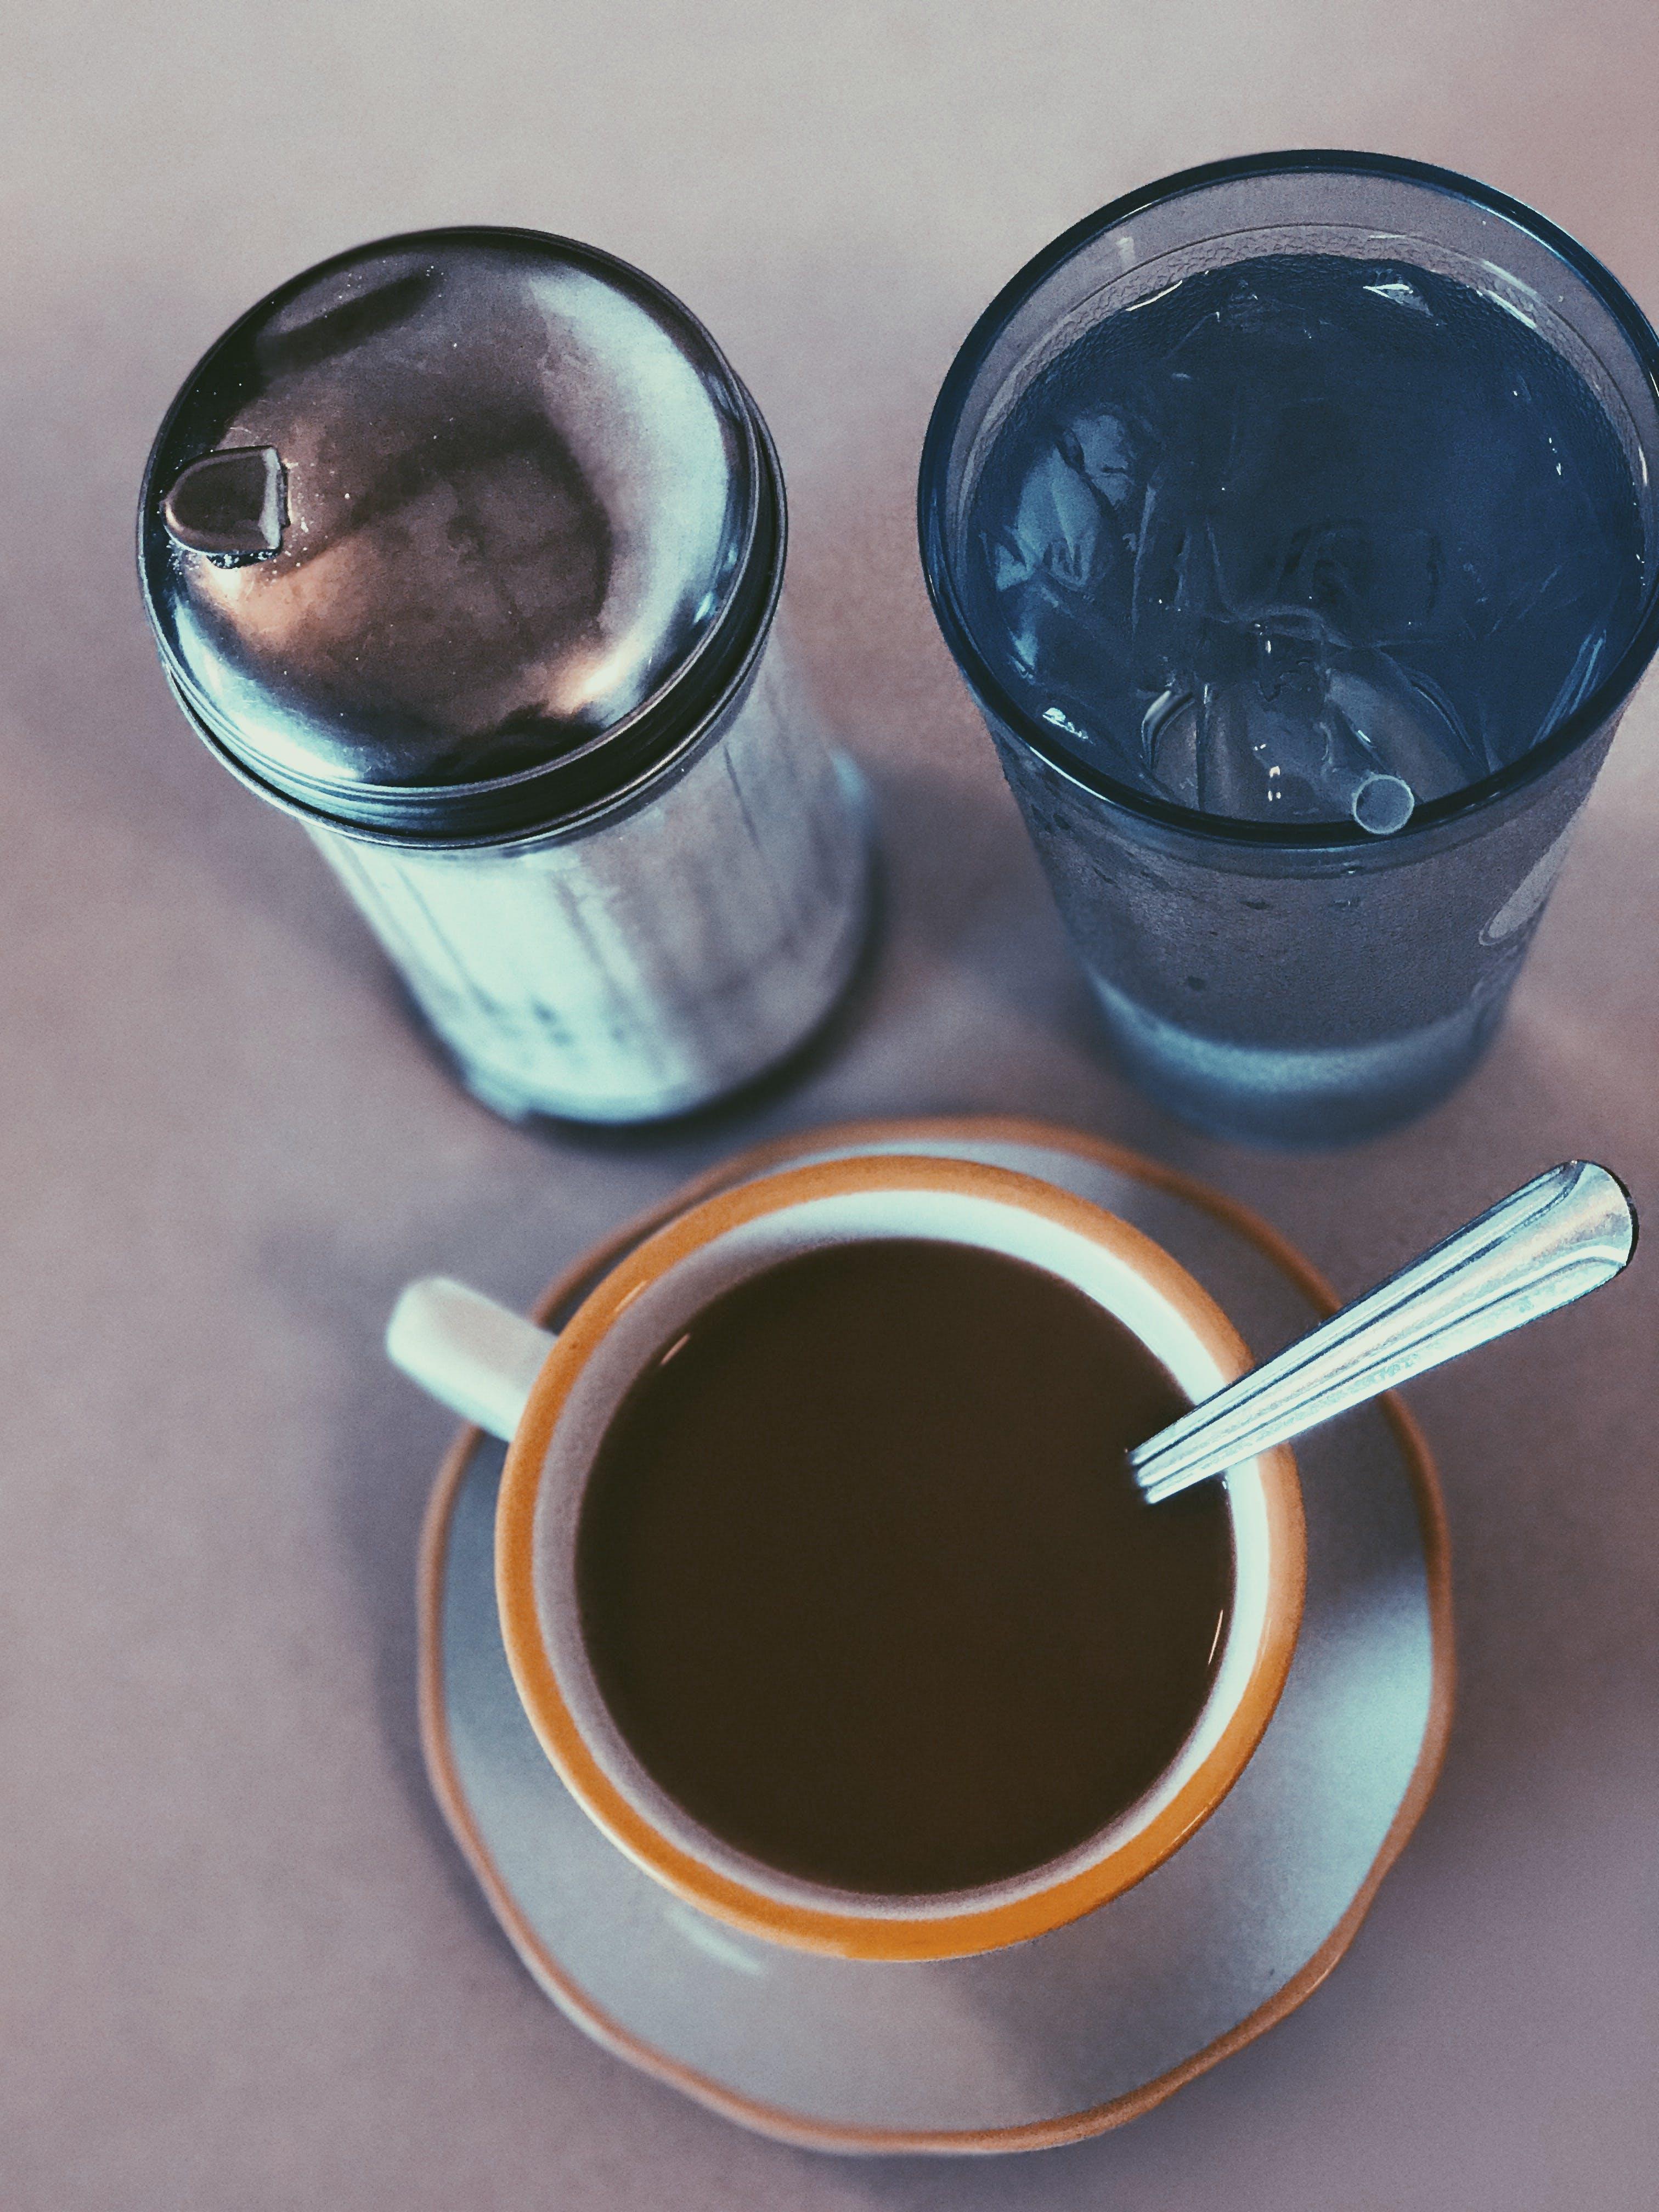 Free stock photo of coffee, spoon, water, sugar